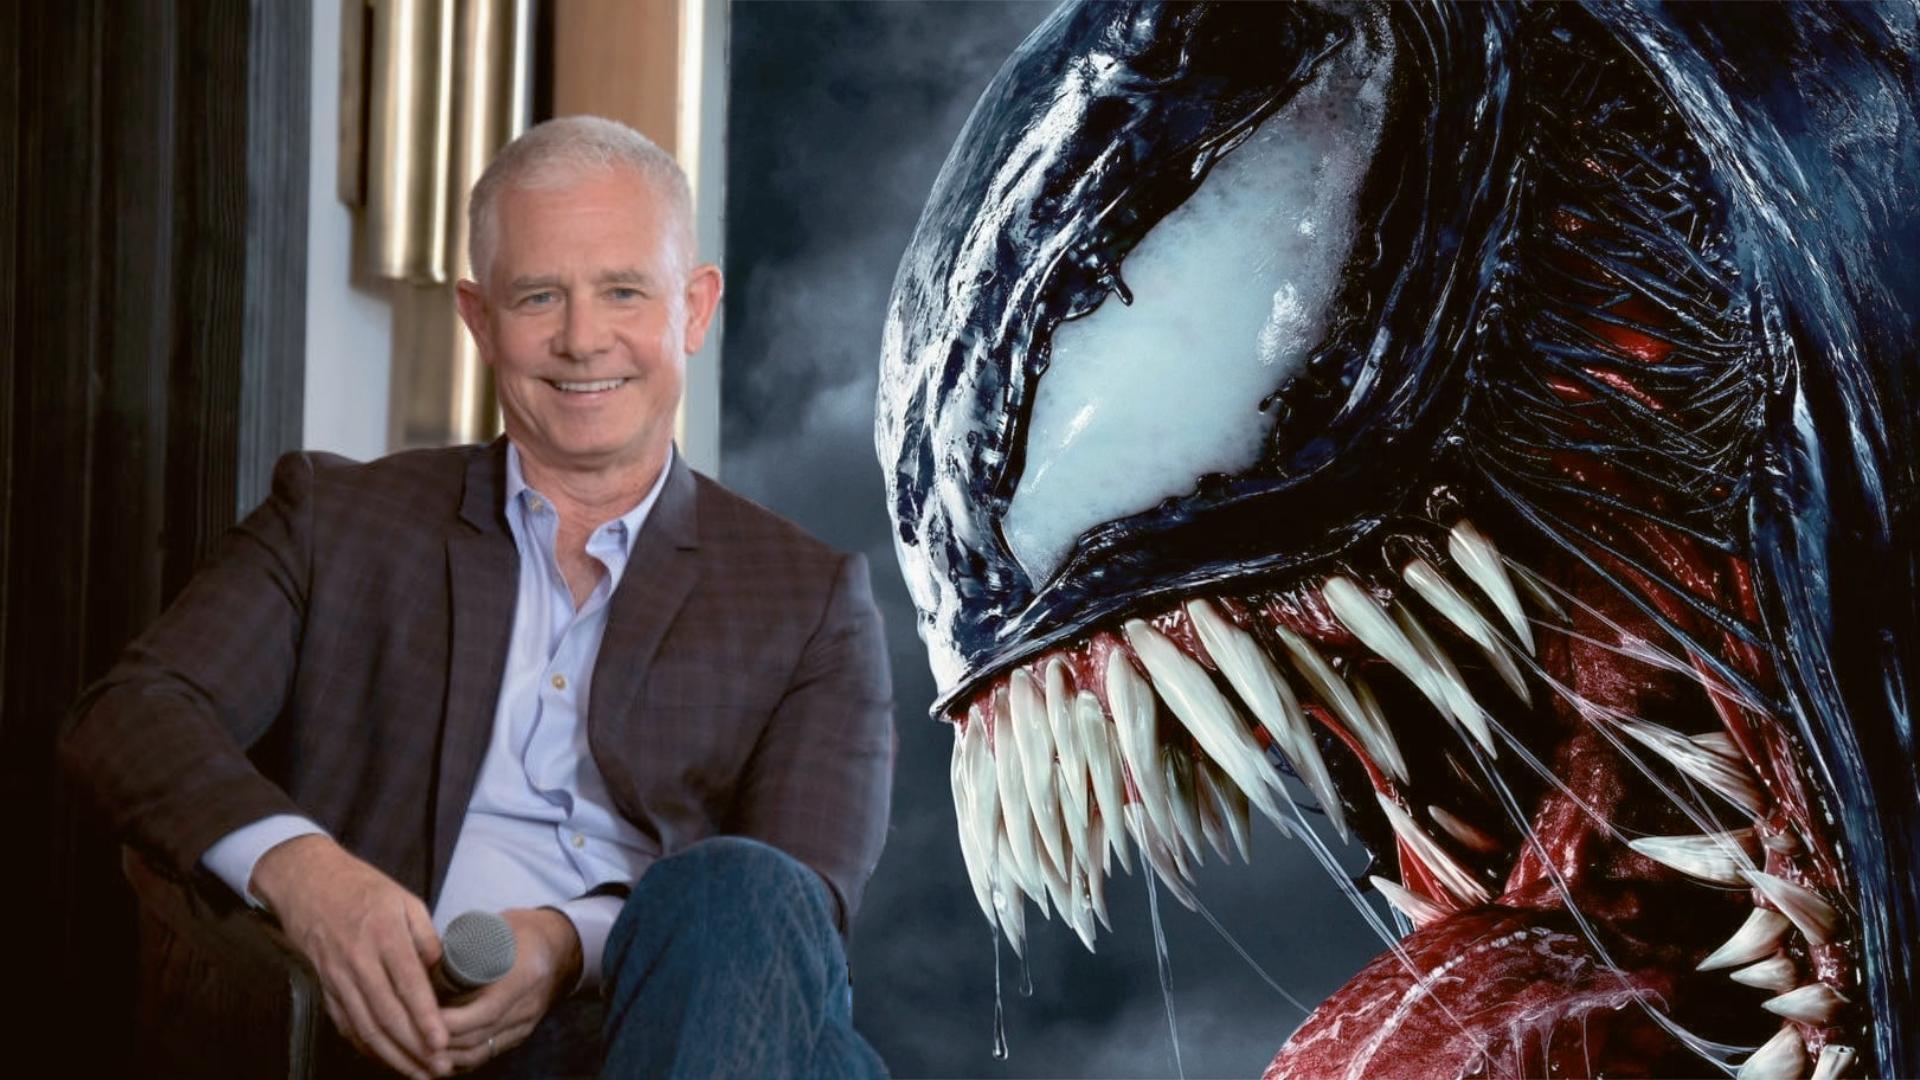 X-Men Movies Producer, Hutch Parker, Joins Sony's 'Venom 2'